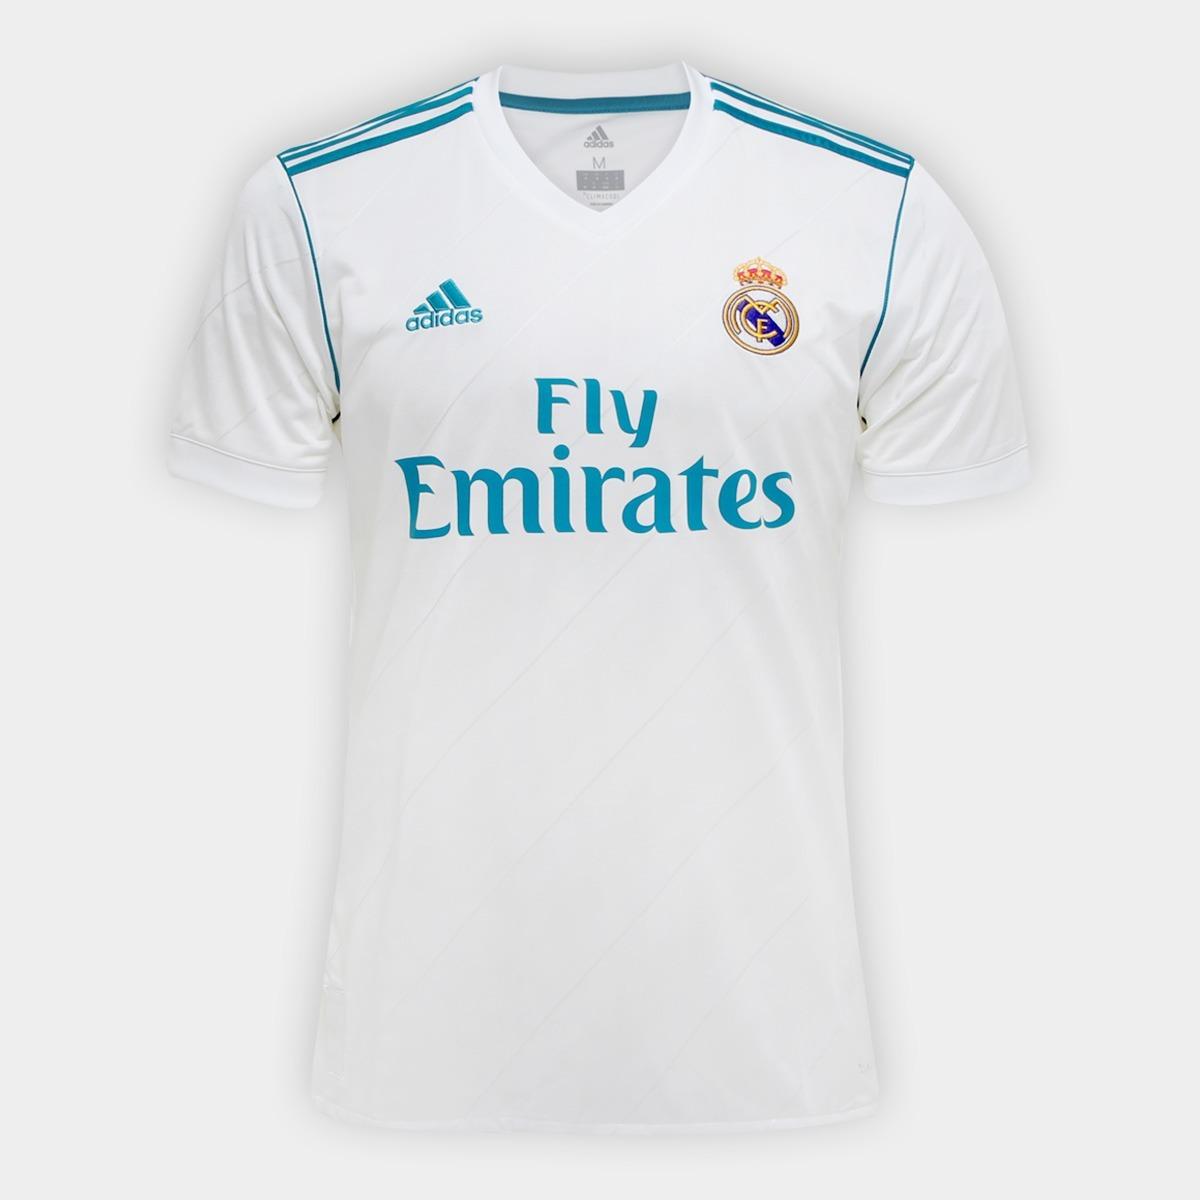 0cdc16bd2821f camisa oficial adidas real madrid 2017 2018. Carregando zoom.